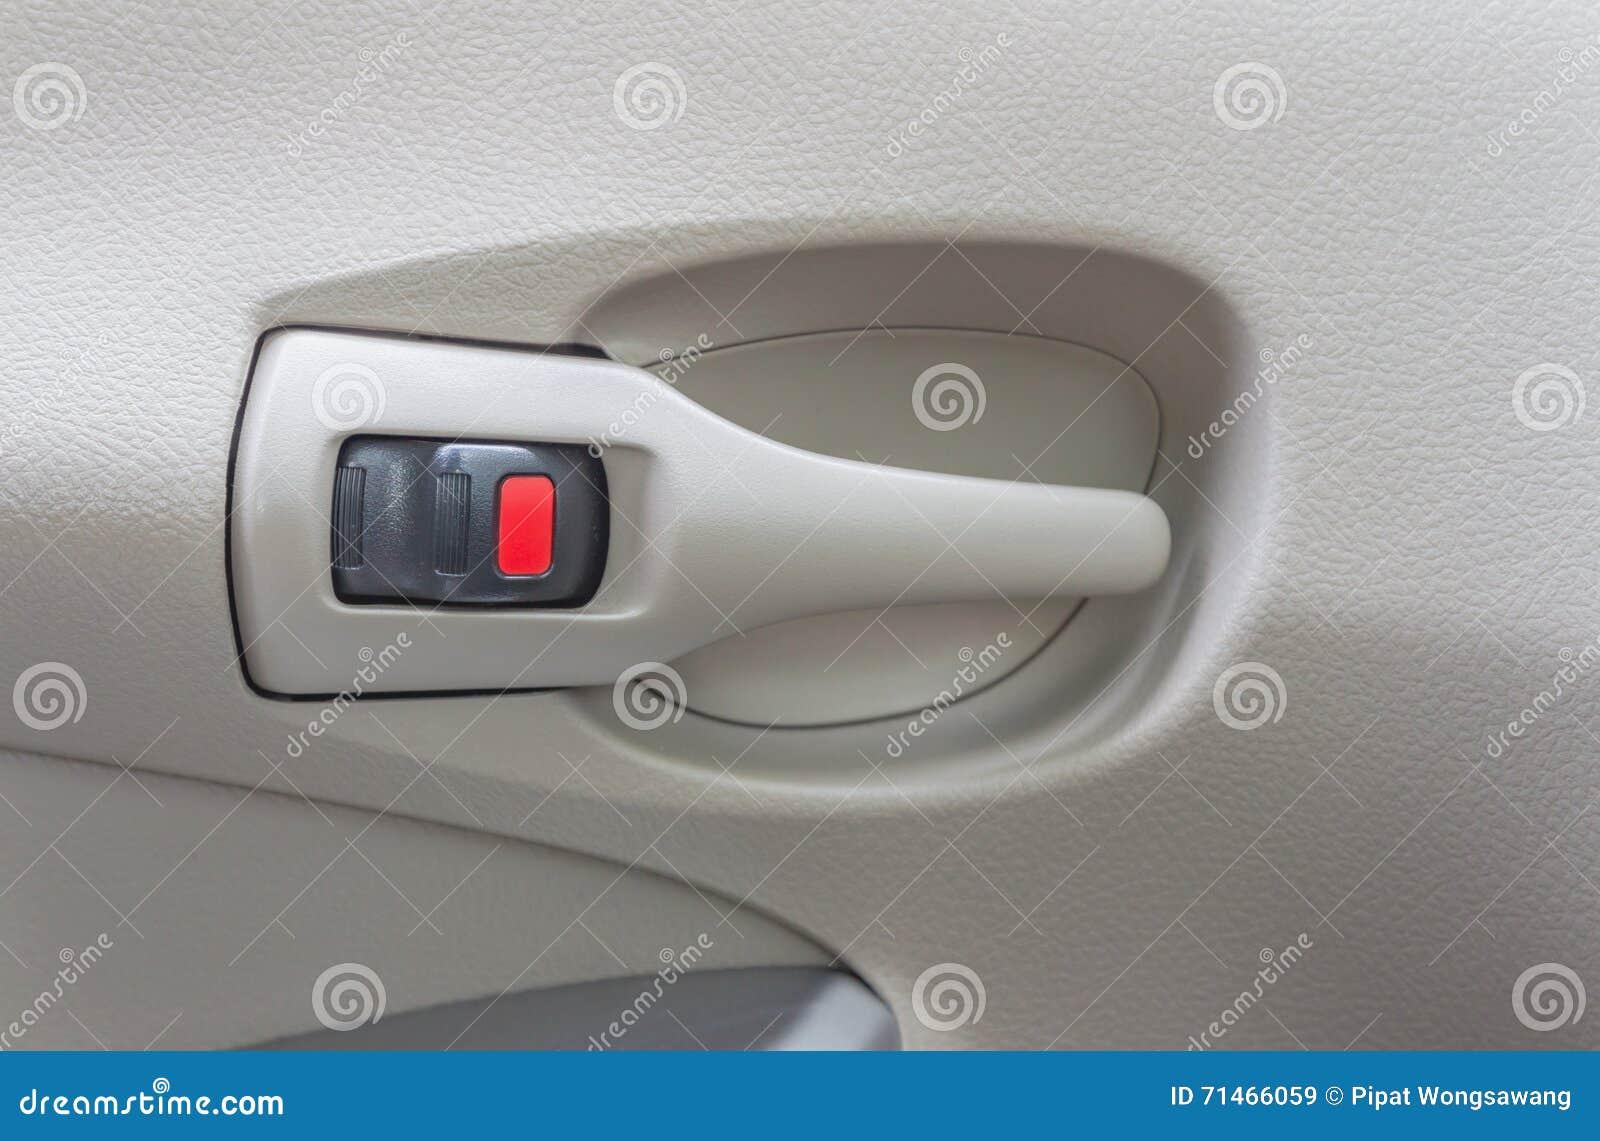 serrure de porti re de voiture image stock image du objets image 71466059. Black Bedroom Furniture Sets. Home Design Ideas